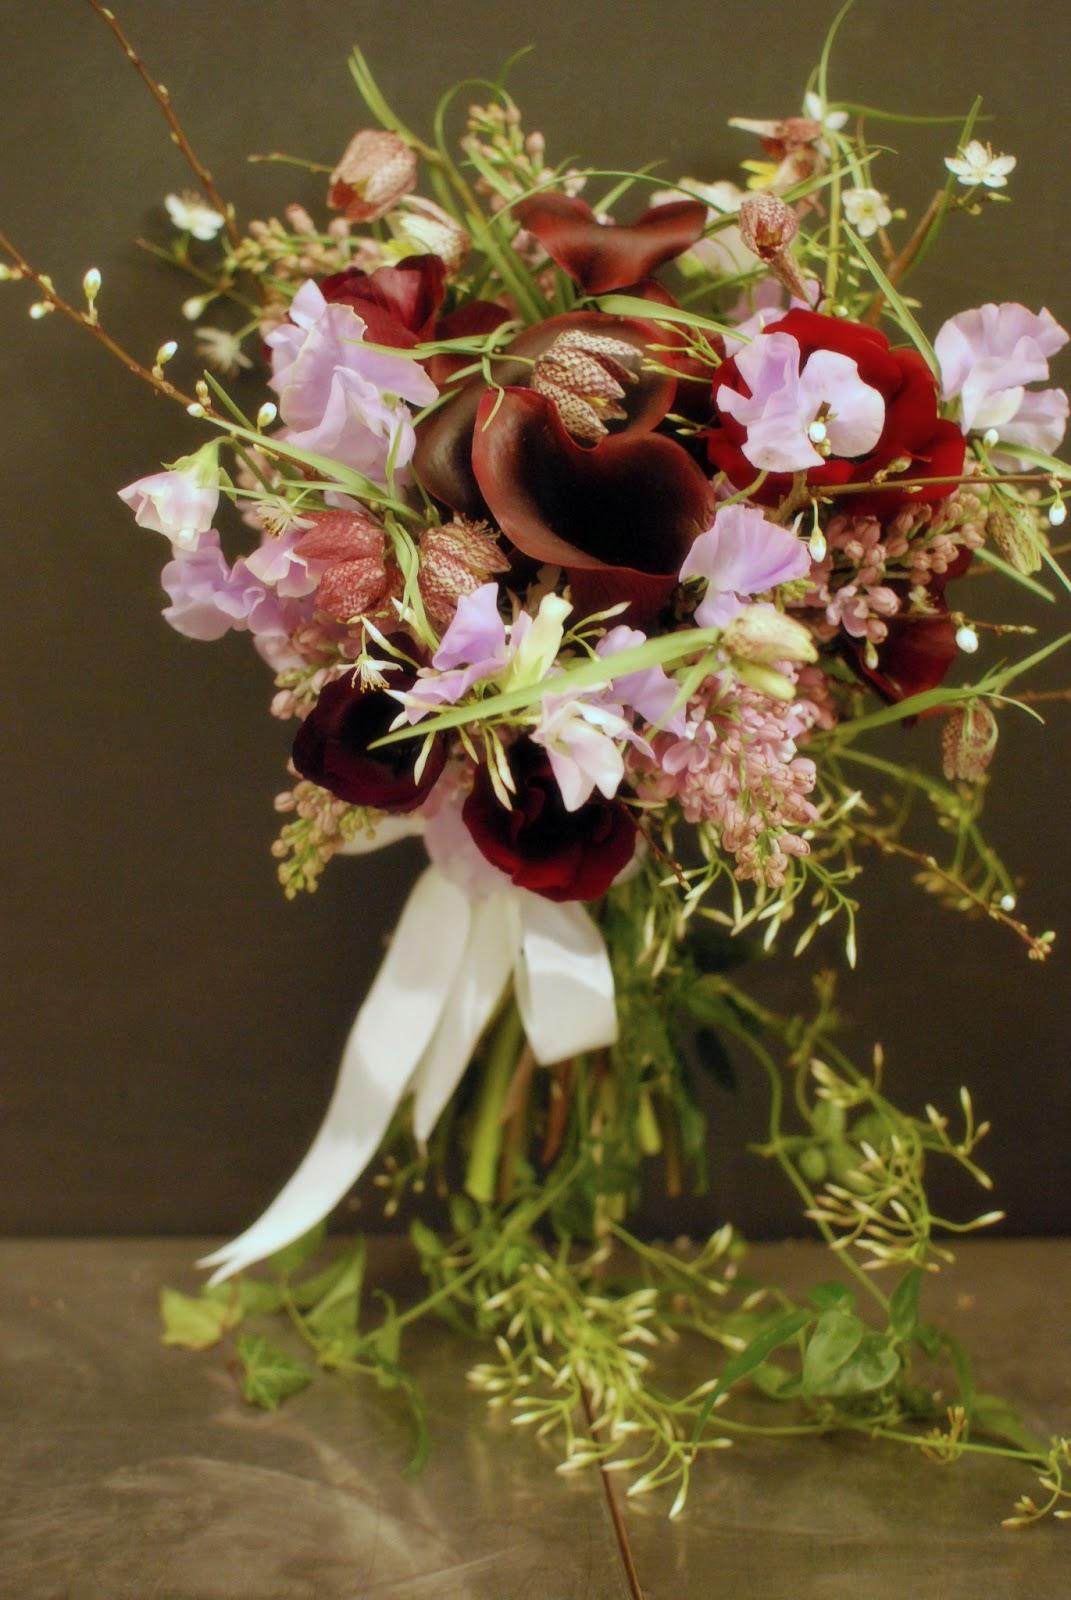 Year Calendar 2014 : Flowerschool catherine muller flower